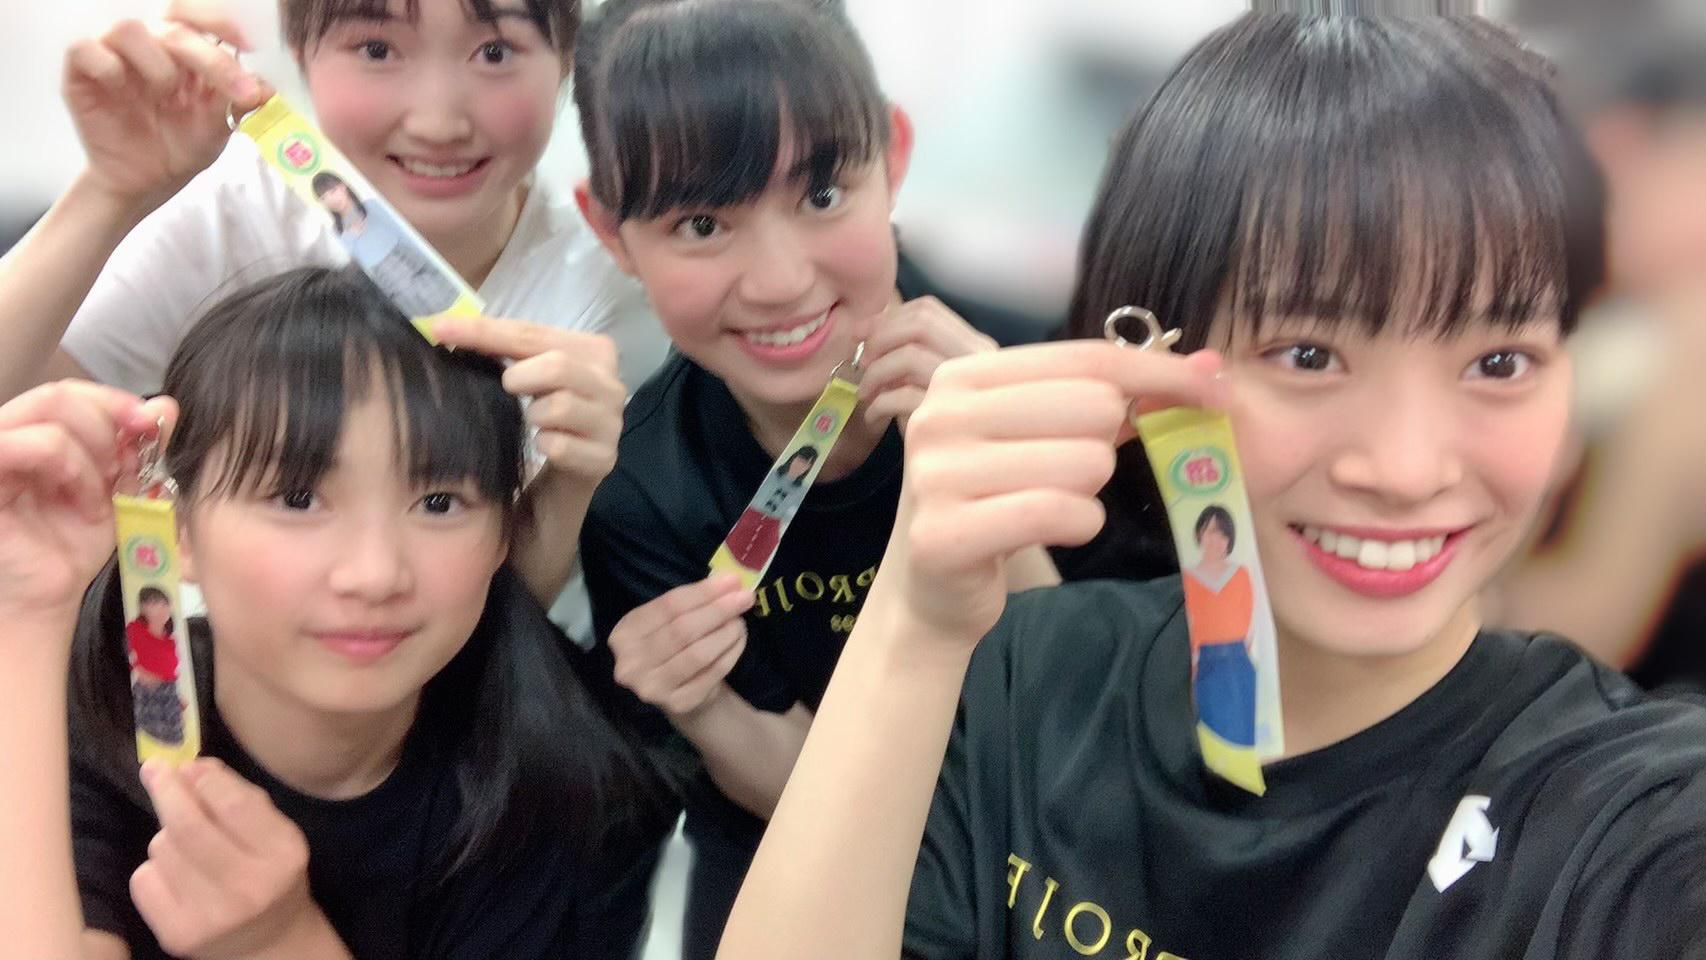 【Juice=Juice】宮本佳林応援スレPart.492【大天使】 YouTube動画>8本 ->画像>600枚